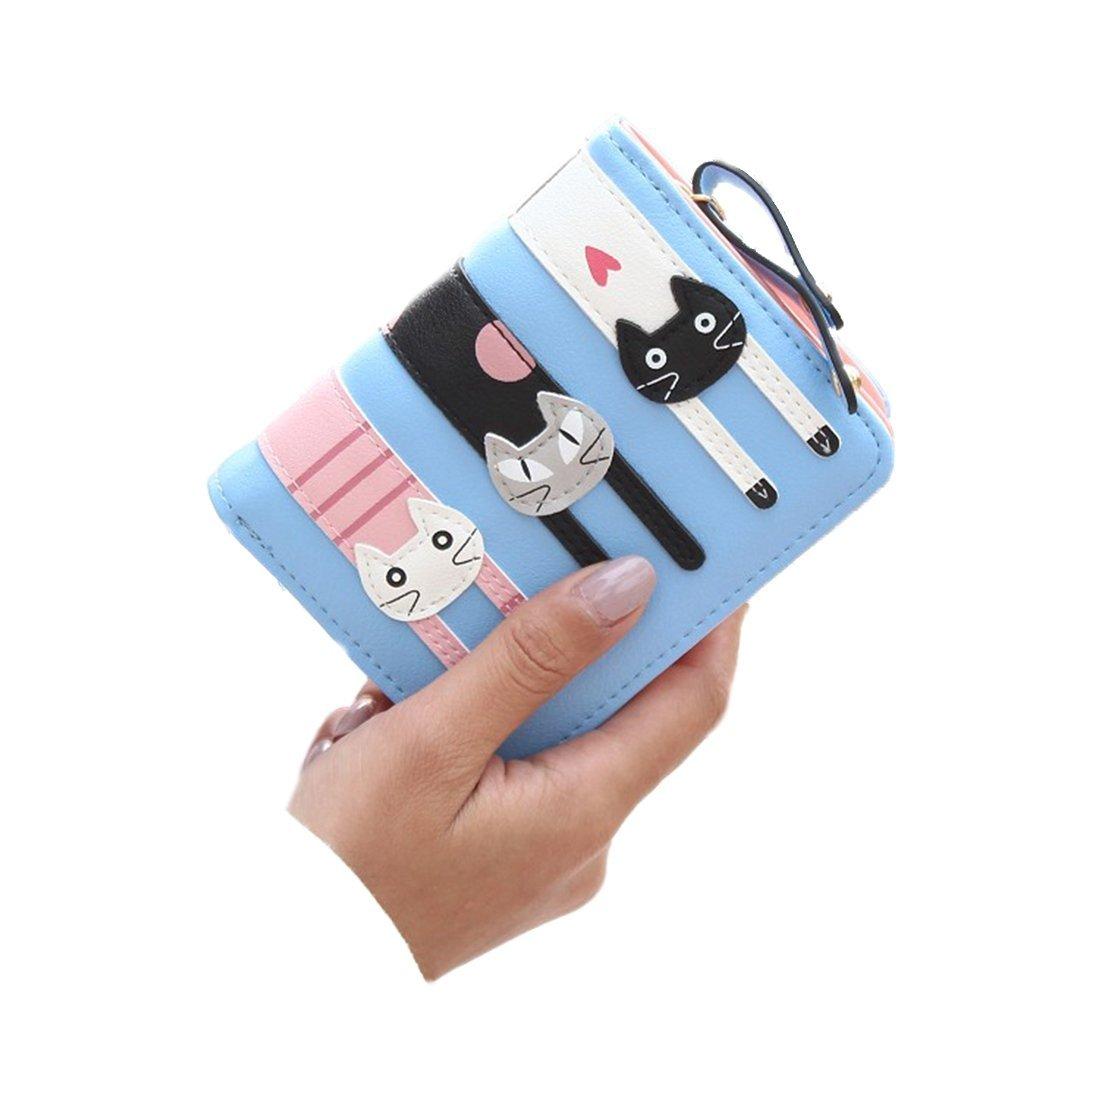 Women Wallet - SODIAL(R)New Fashion Women Cat Wallet Cartoon purse Female Card Holder Lady clutch coin purse Female zipper(Short Light Blue)